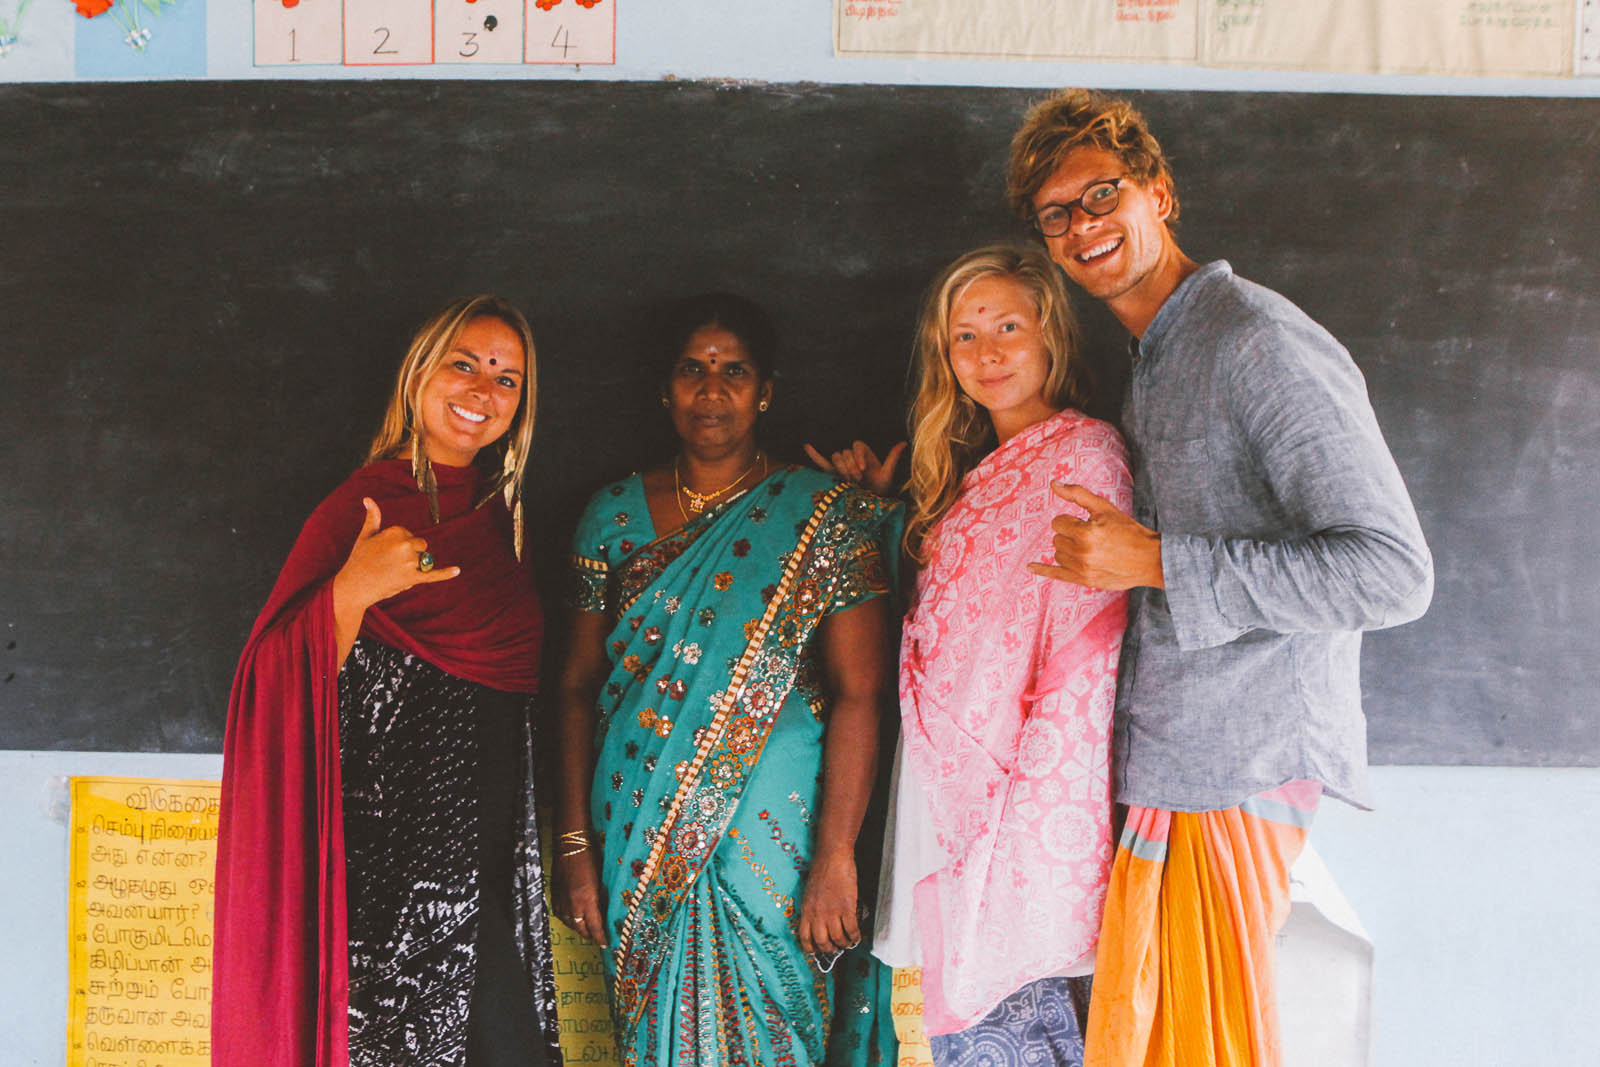 Sri Lanka-charity-school-voluenteer-work-pottuvil-IMG_5036